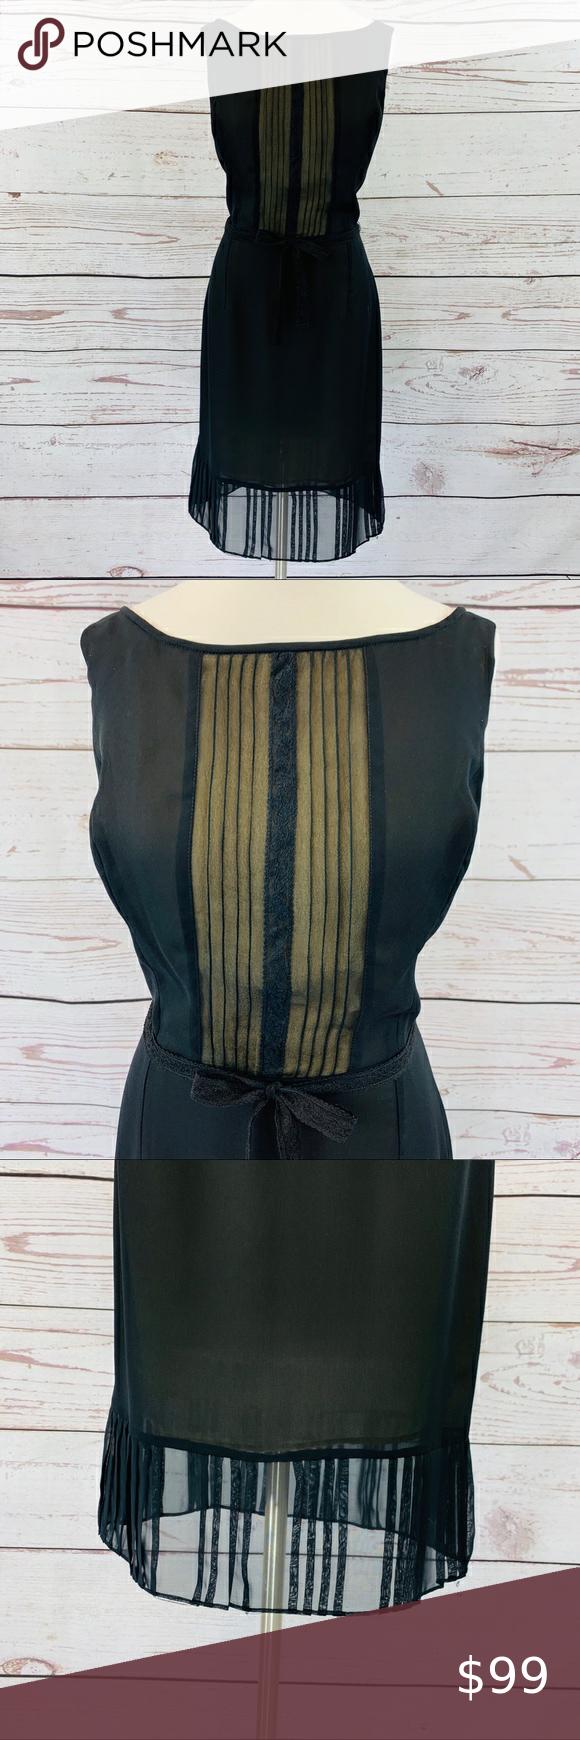 Gia Co Black Vintage Dress Sheer And Cream Vintage Black Dress Vintage Dresses Sheer Dress [ 1740 x 580 Pixel ]